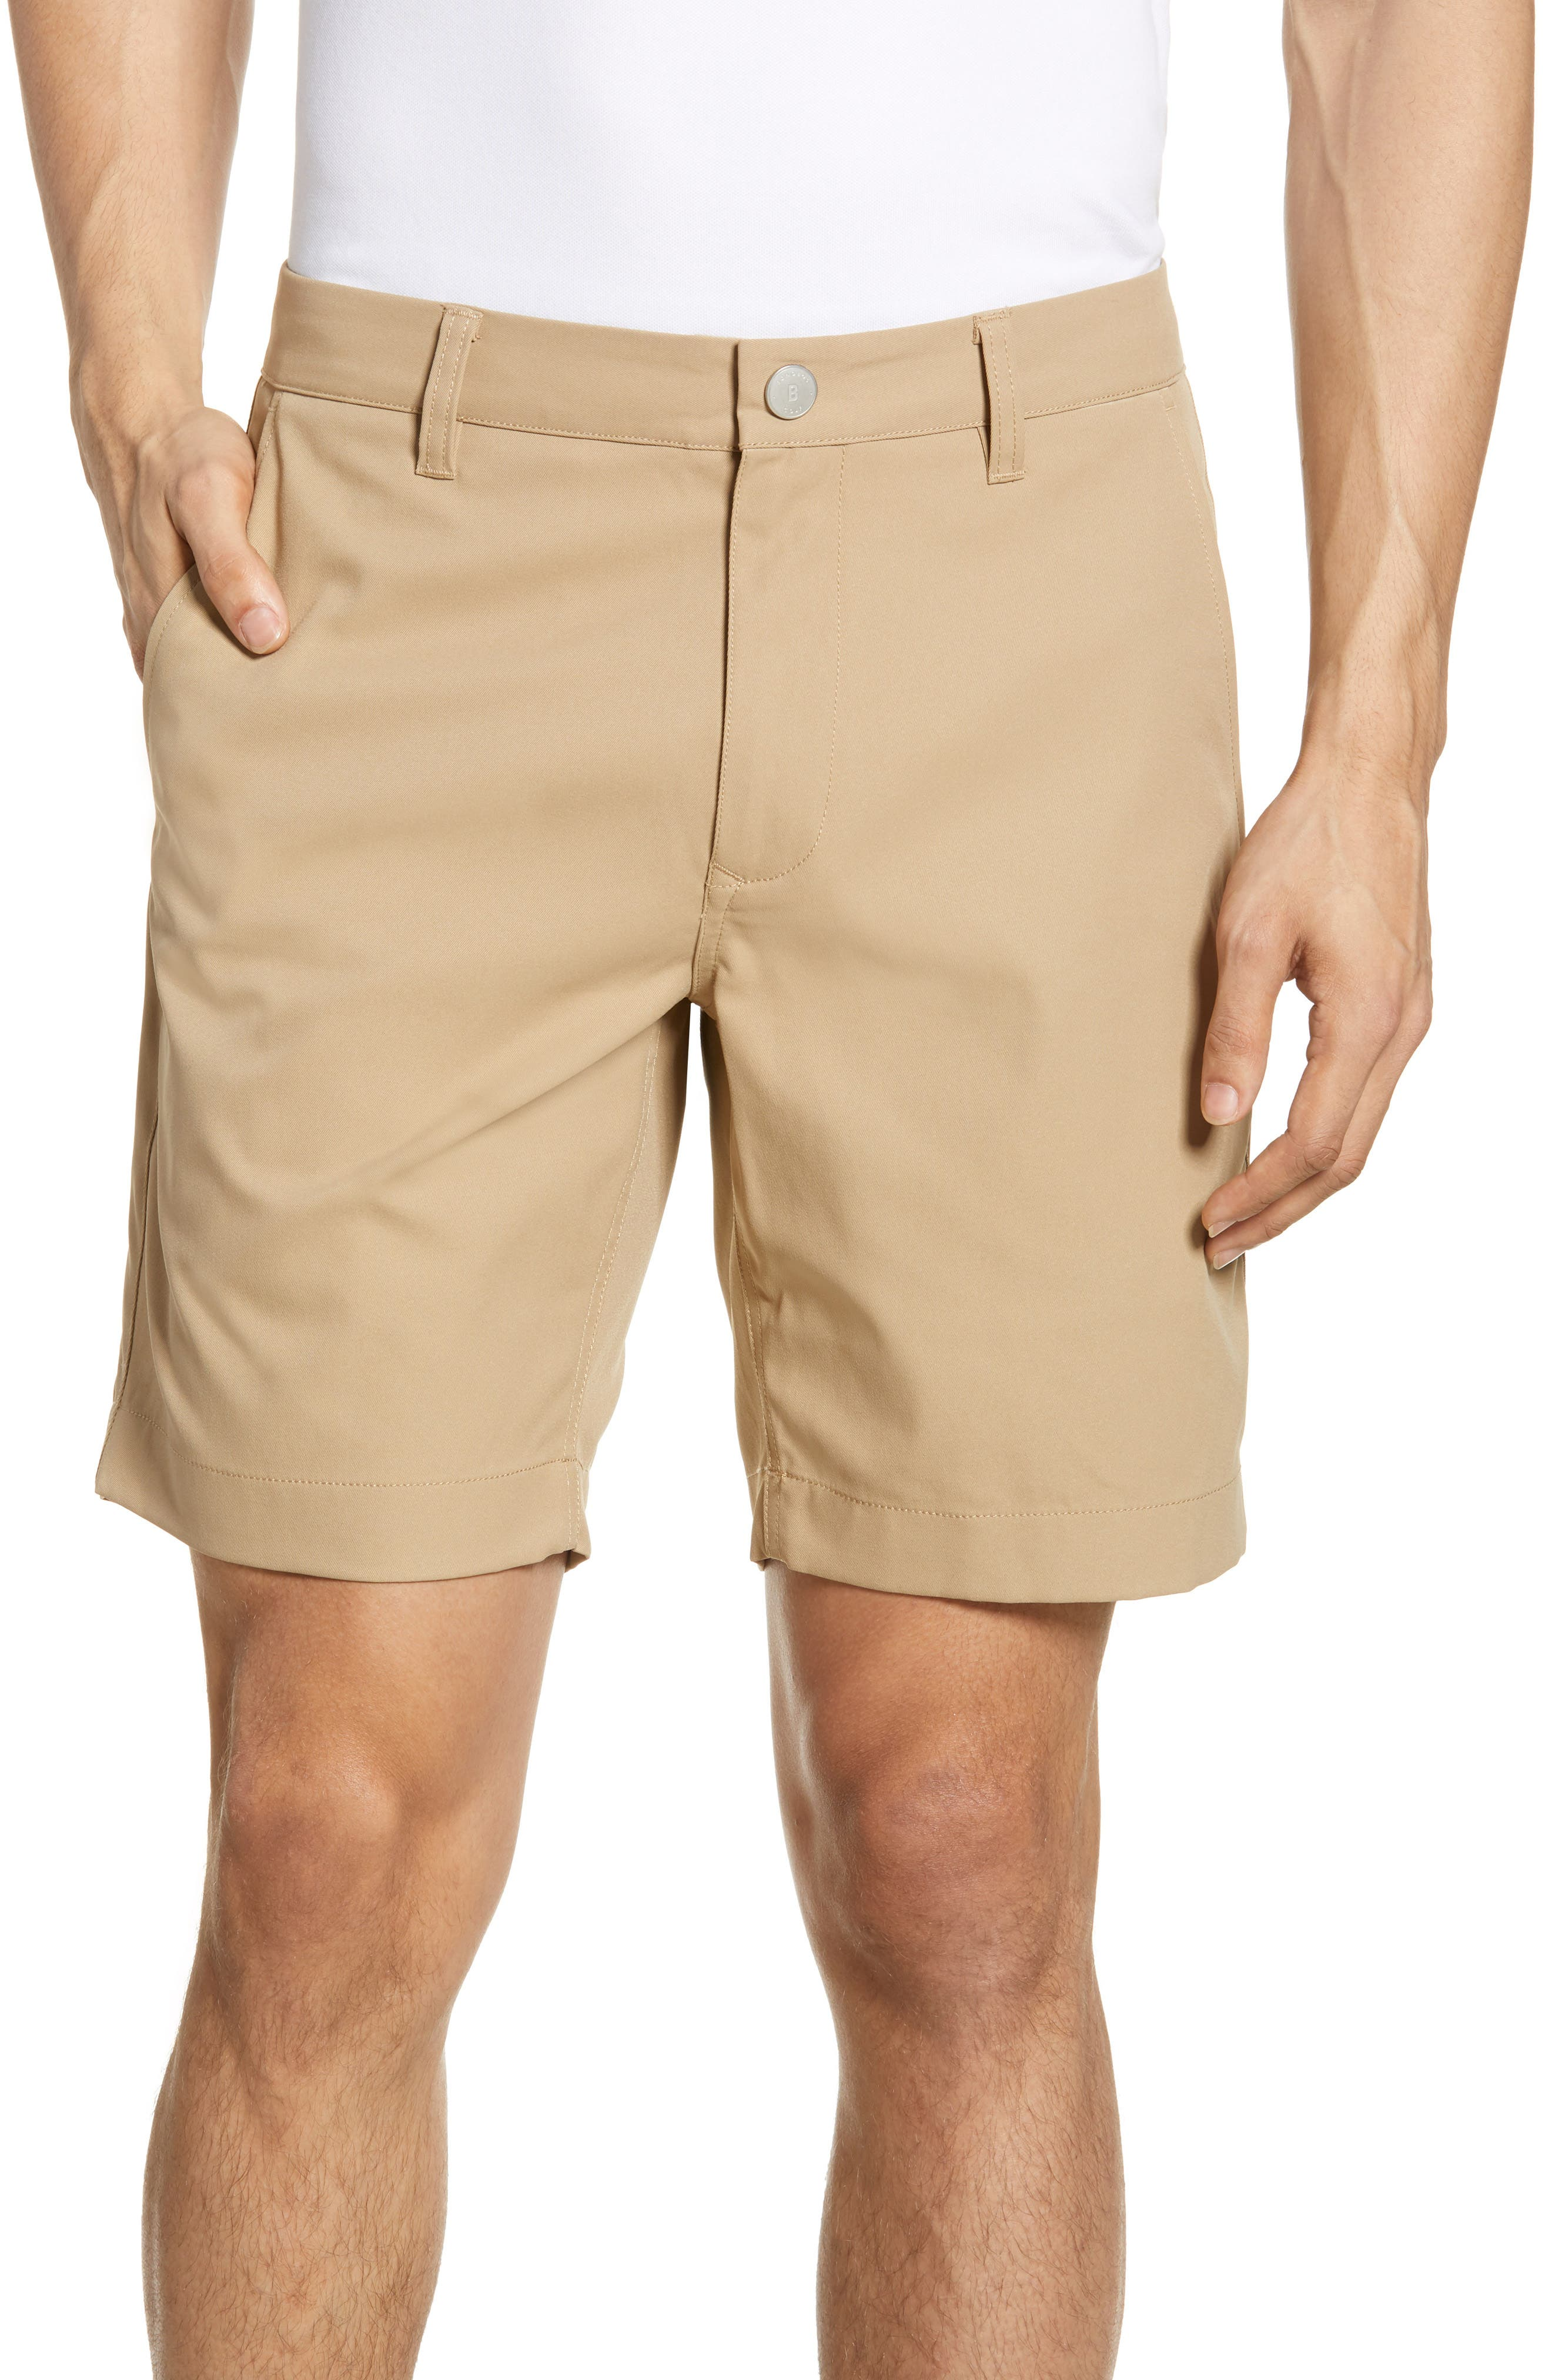 The Highland Golf Shorts